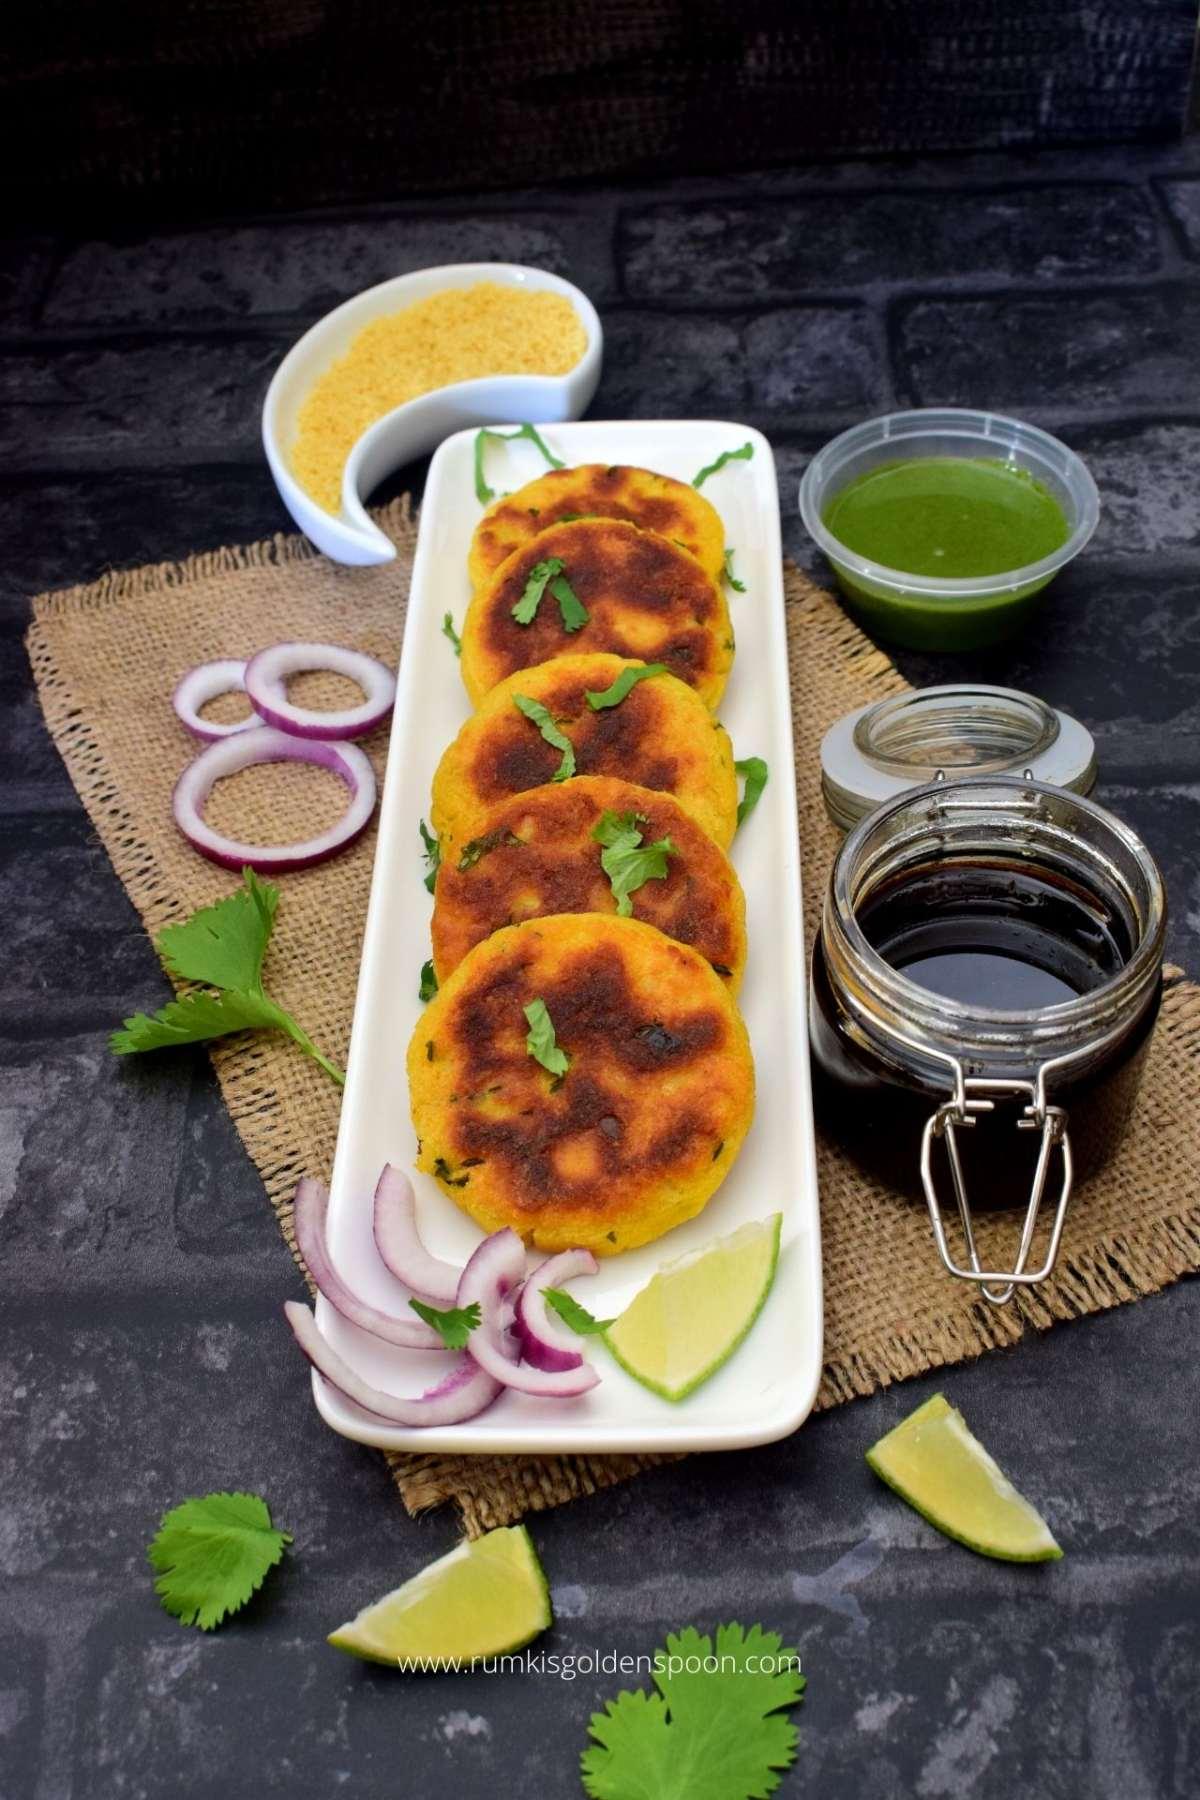 aloo tikki, aloo tikka, aloo tikki recipe, aloo ki tikki, aloo patty, how to make aloo tikki, aloo tikki burger, aloo patty recipe, aloo ki tikki recipe, aloo tikki kaise banate hain, alu tikki, aloo tikki frozen, how to make aloo patty, aloo tikki ingredients, aloo tikki easy recipe, aloo tikki for fast, Indian chaat recipe, Indian chaat recipes, chaat recipe, recipe for chaat, recipes of chaat, chaat recipe Indian, indian street food, list of indian street food, recipes for Indian street food, recipes of Indian street food, best Indian street food recipes, Indian street food recipes, Indian snack recipe, Indian snack recipes, Indian snacks recipes for evening, Indian snacks easy recipes, Rumki's Golden Spoon